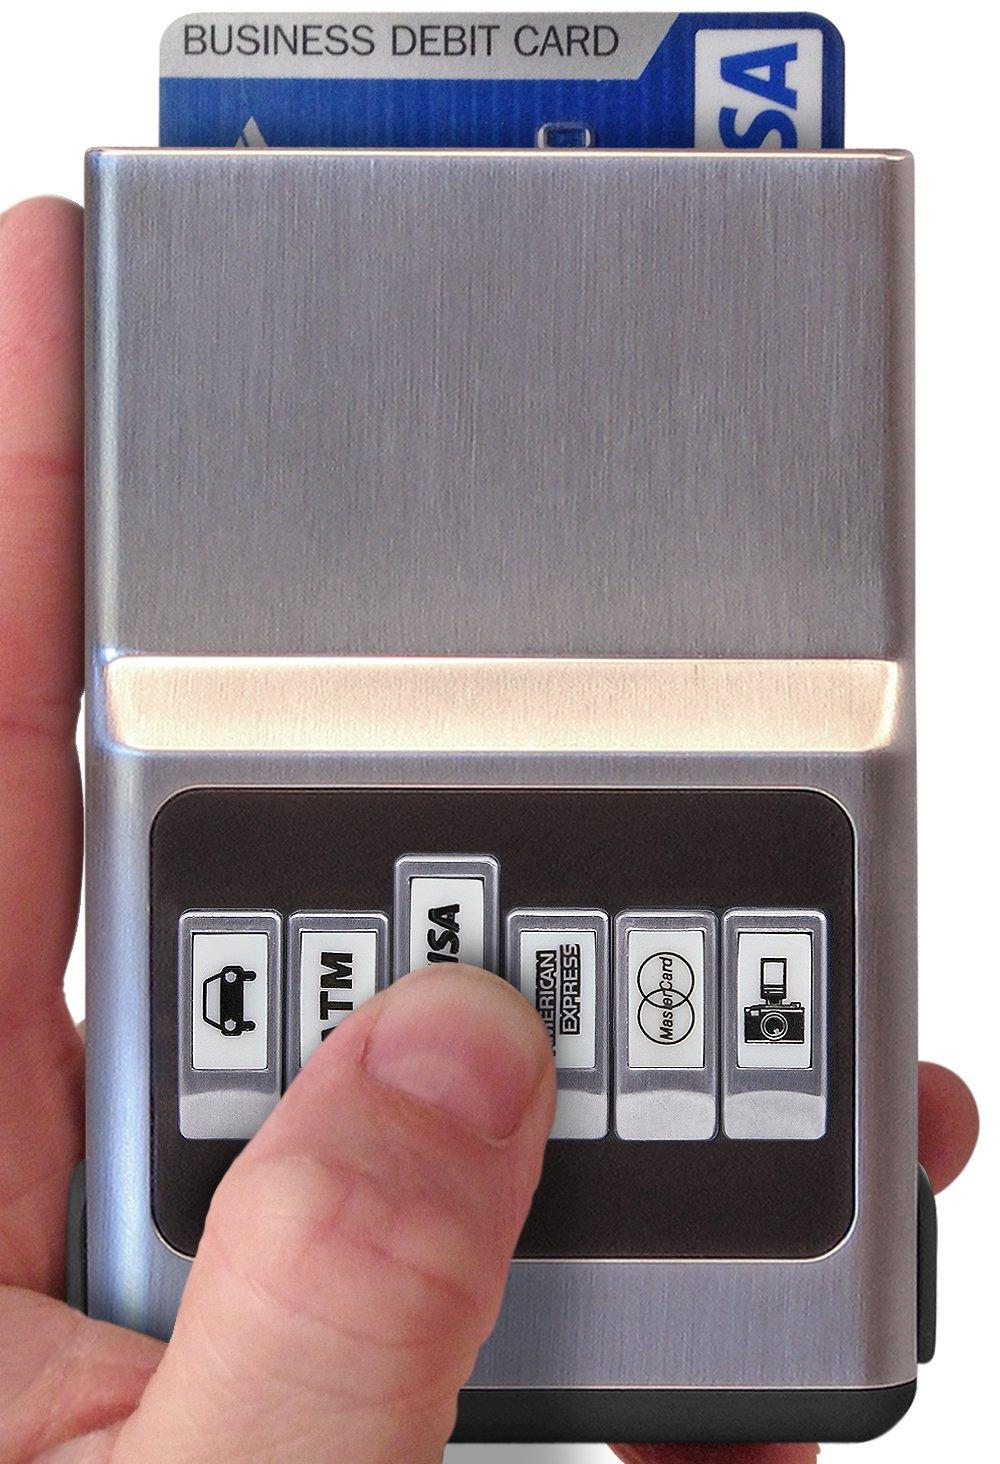 ACM Wallet Credit Card Holder - Black Hybrid Organizer & Money Clip - Easy Push Button Use, Eliminate Scratching Static & Damage for Men & Women